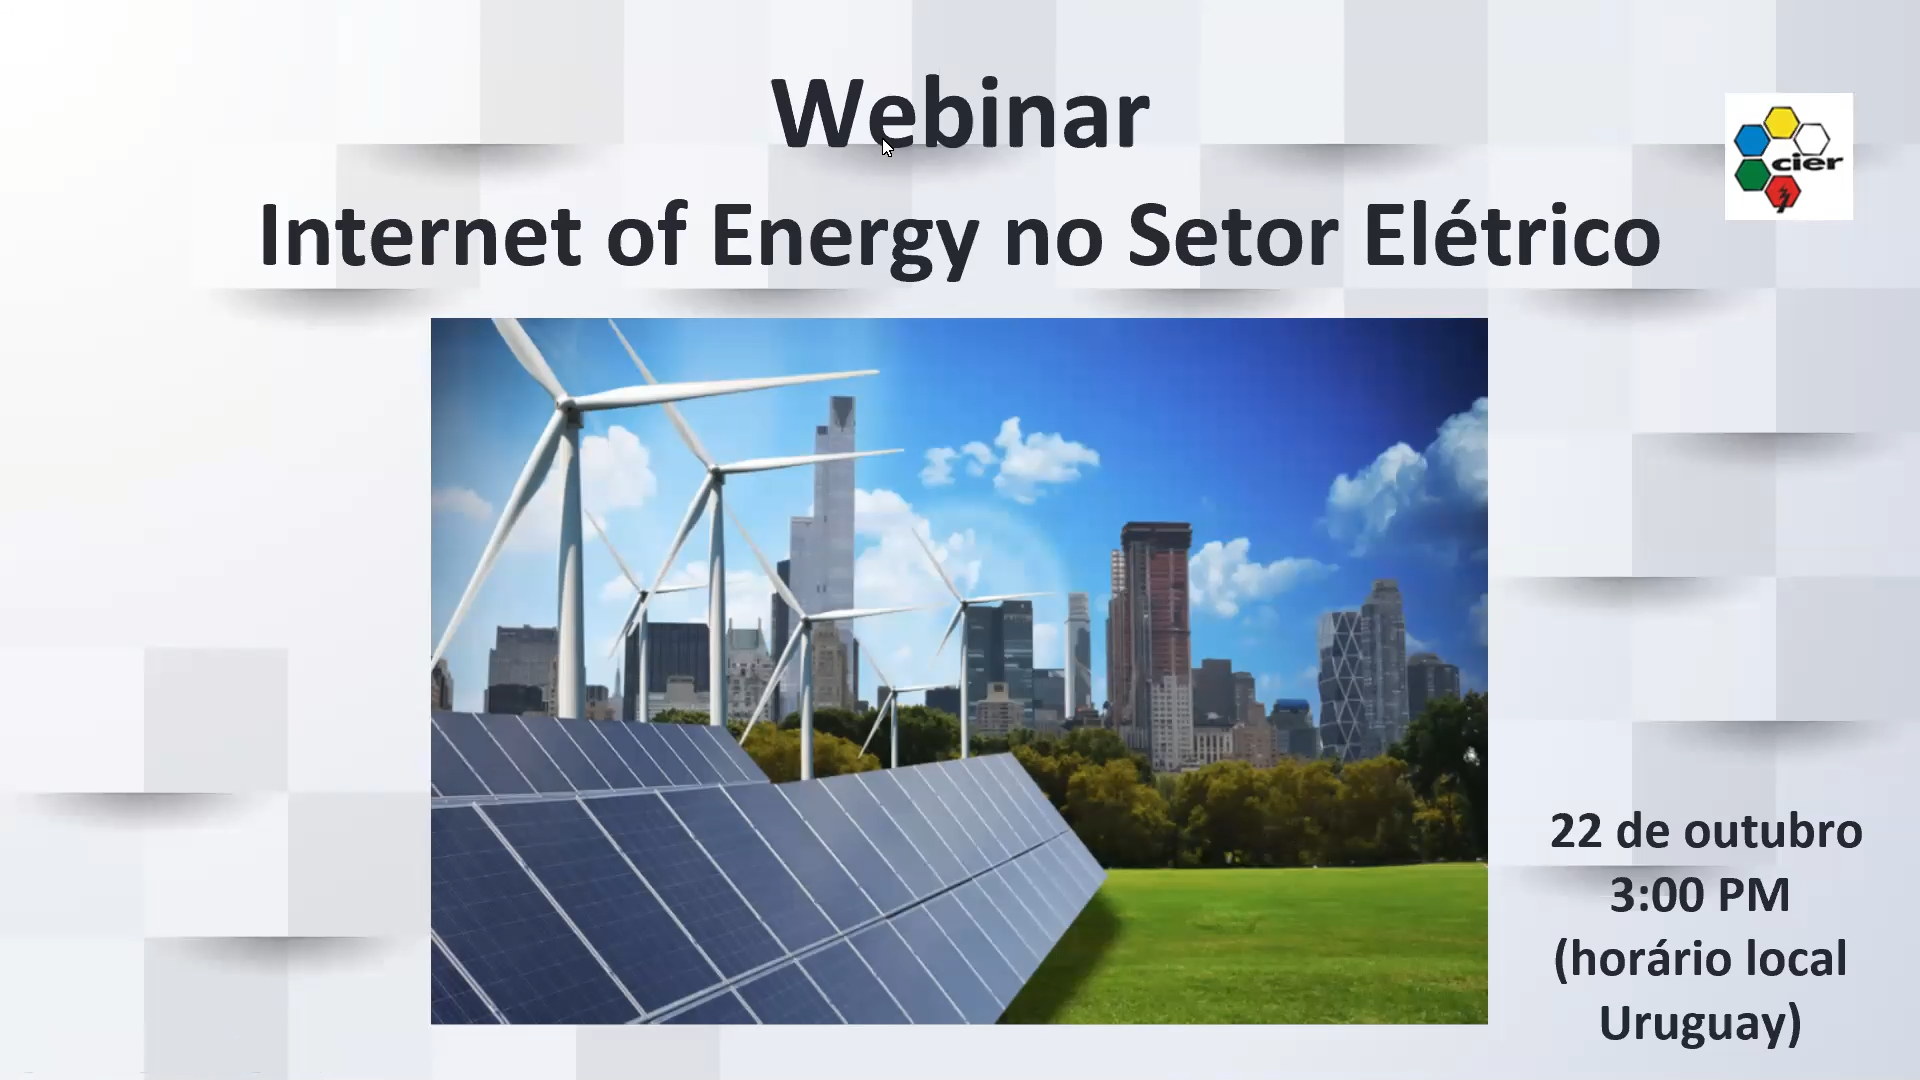 IoE – Internet of Energy no Setor Elétrico